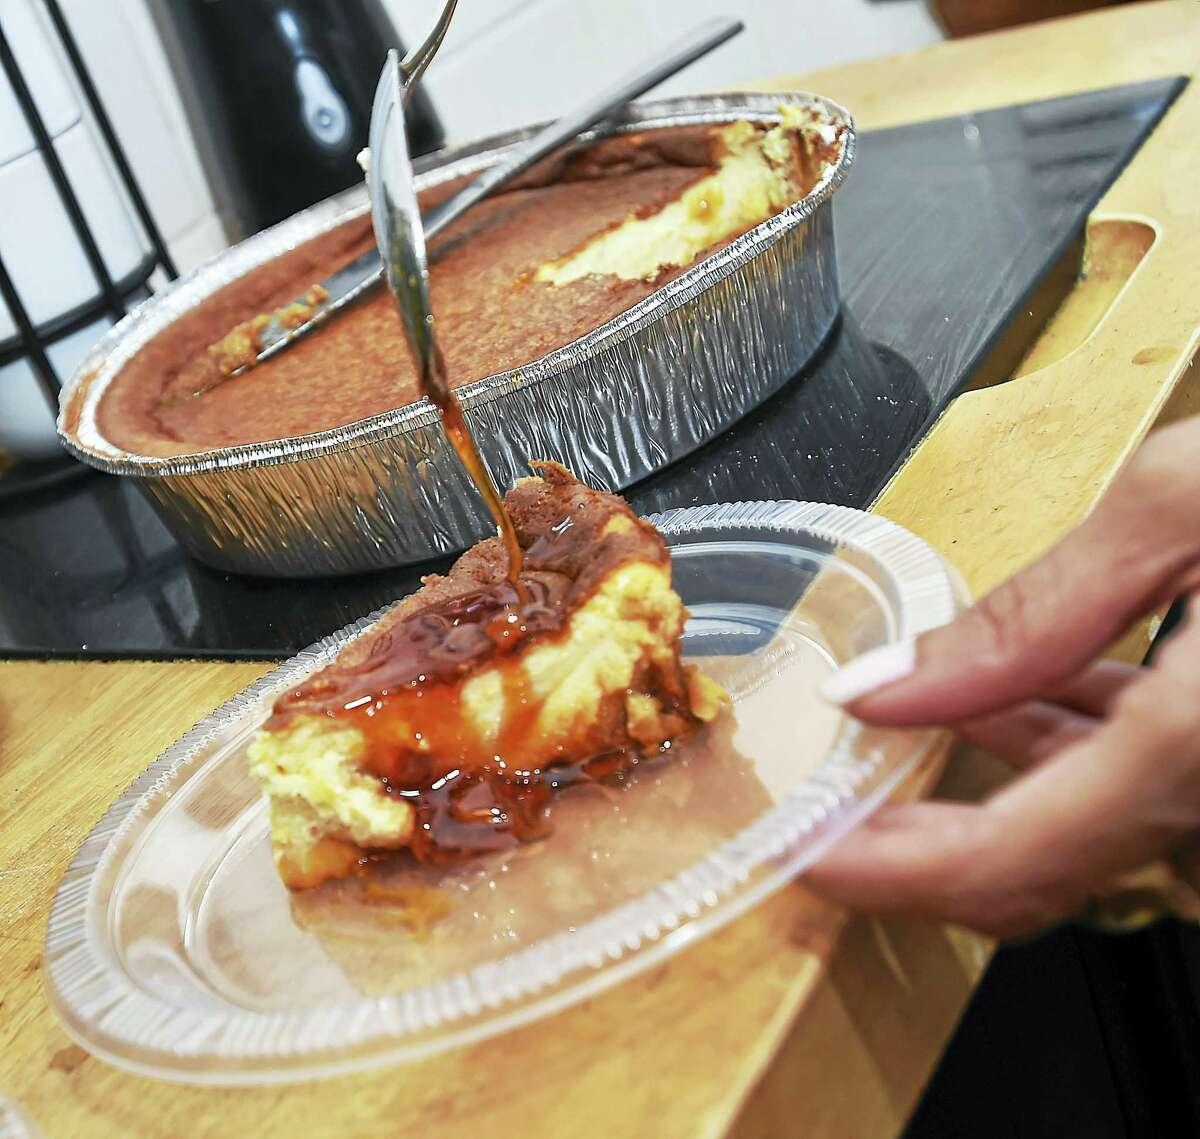 Johanna Torres adds caramelized sugar to a cream cheese flan in her Branford kitchen.